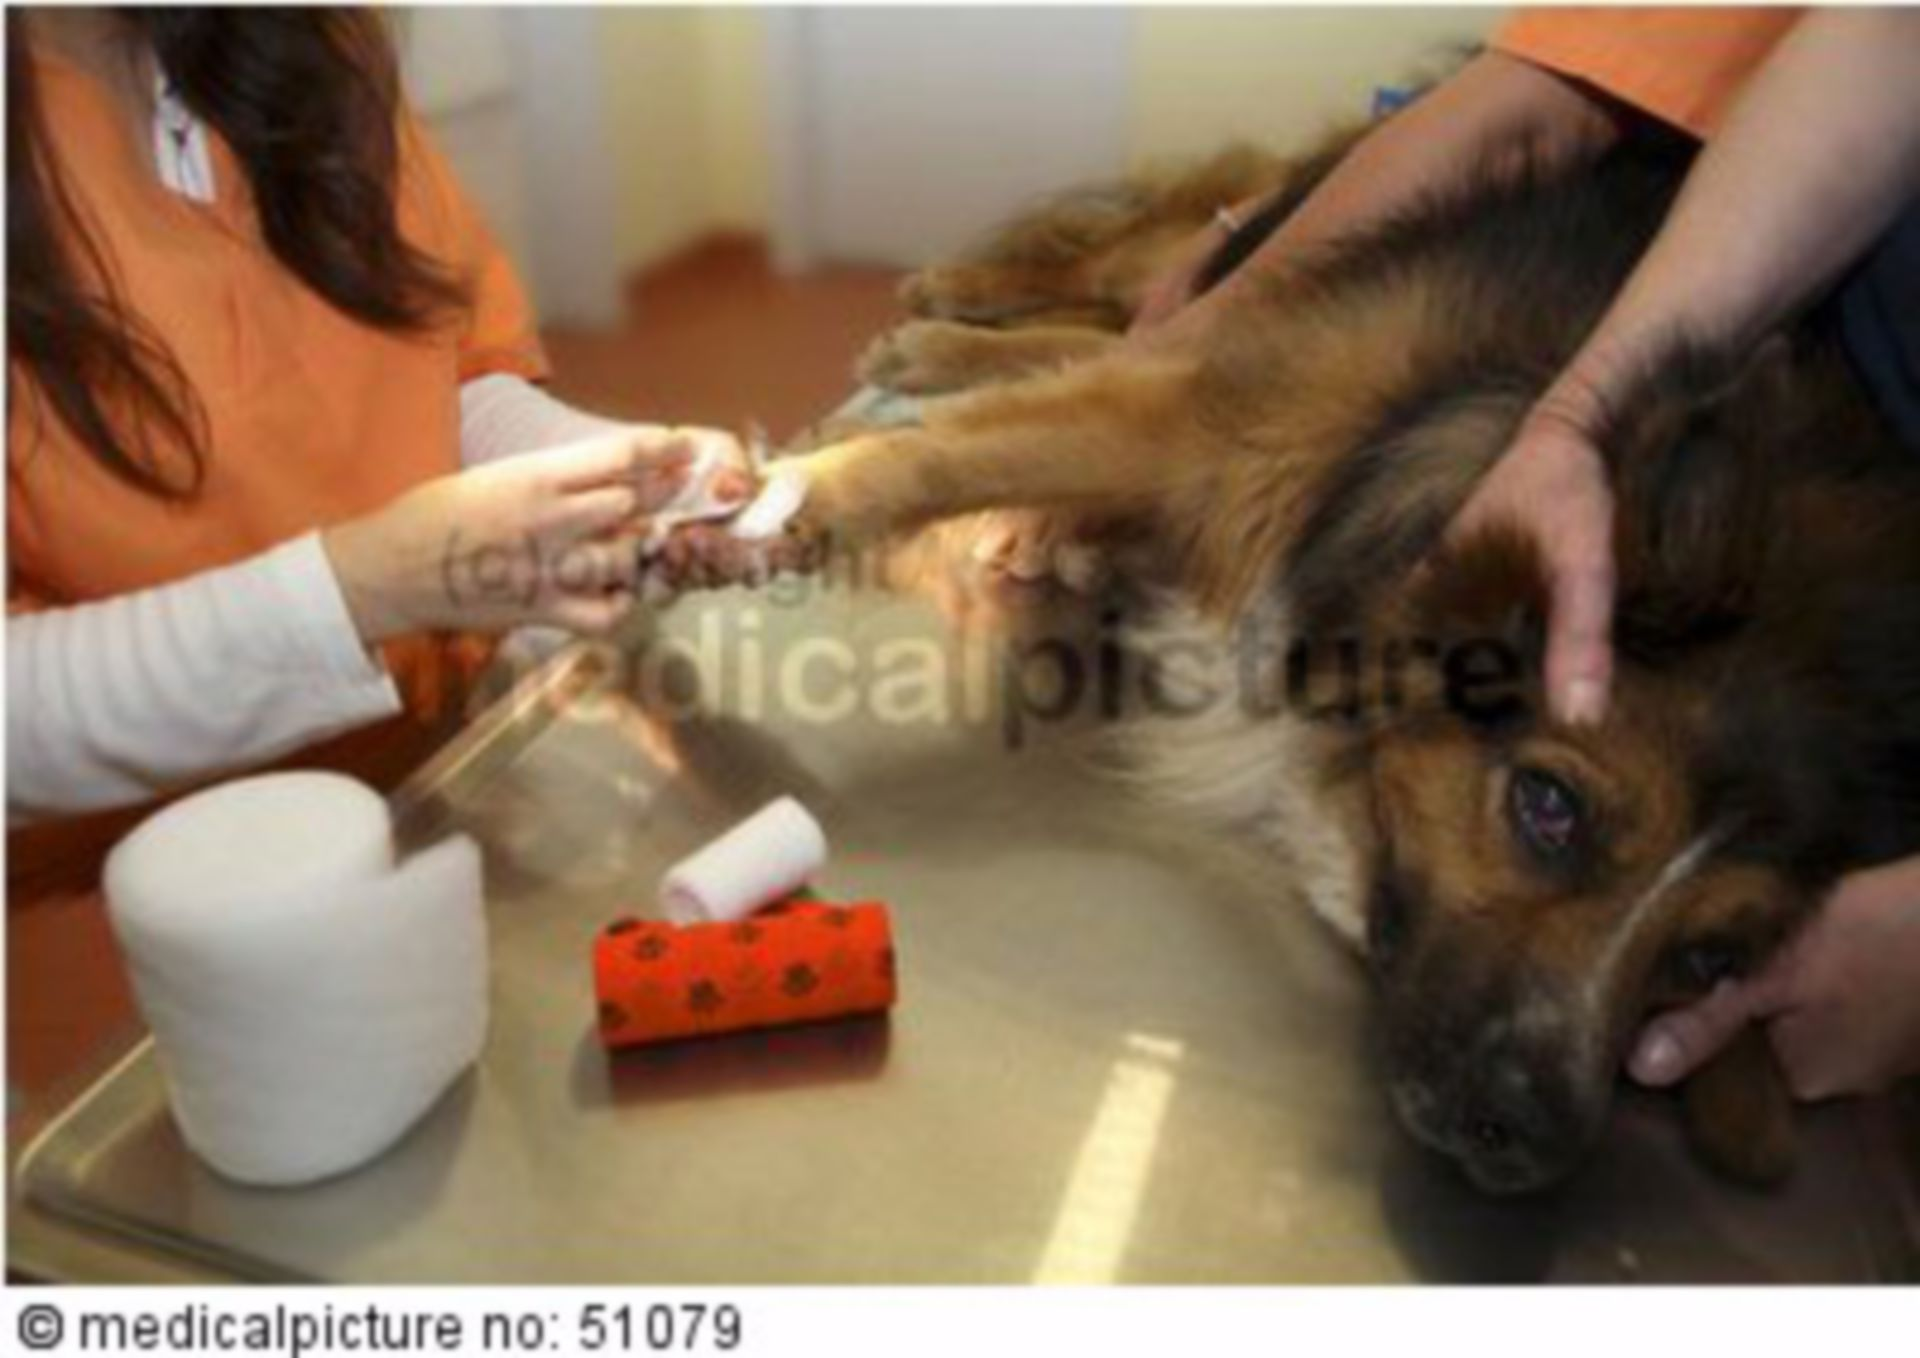 Bandage change on dog`s paw, veterinarian